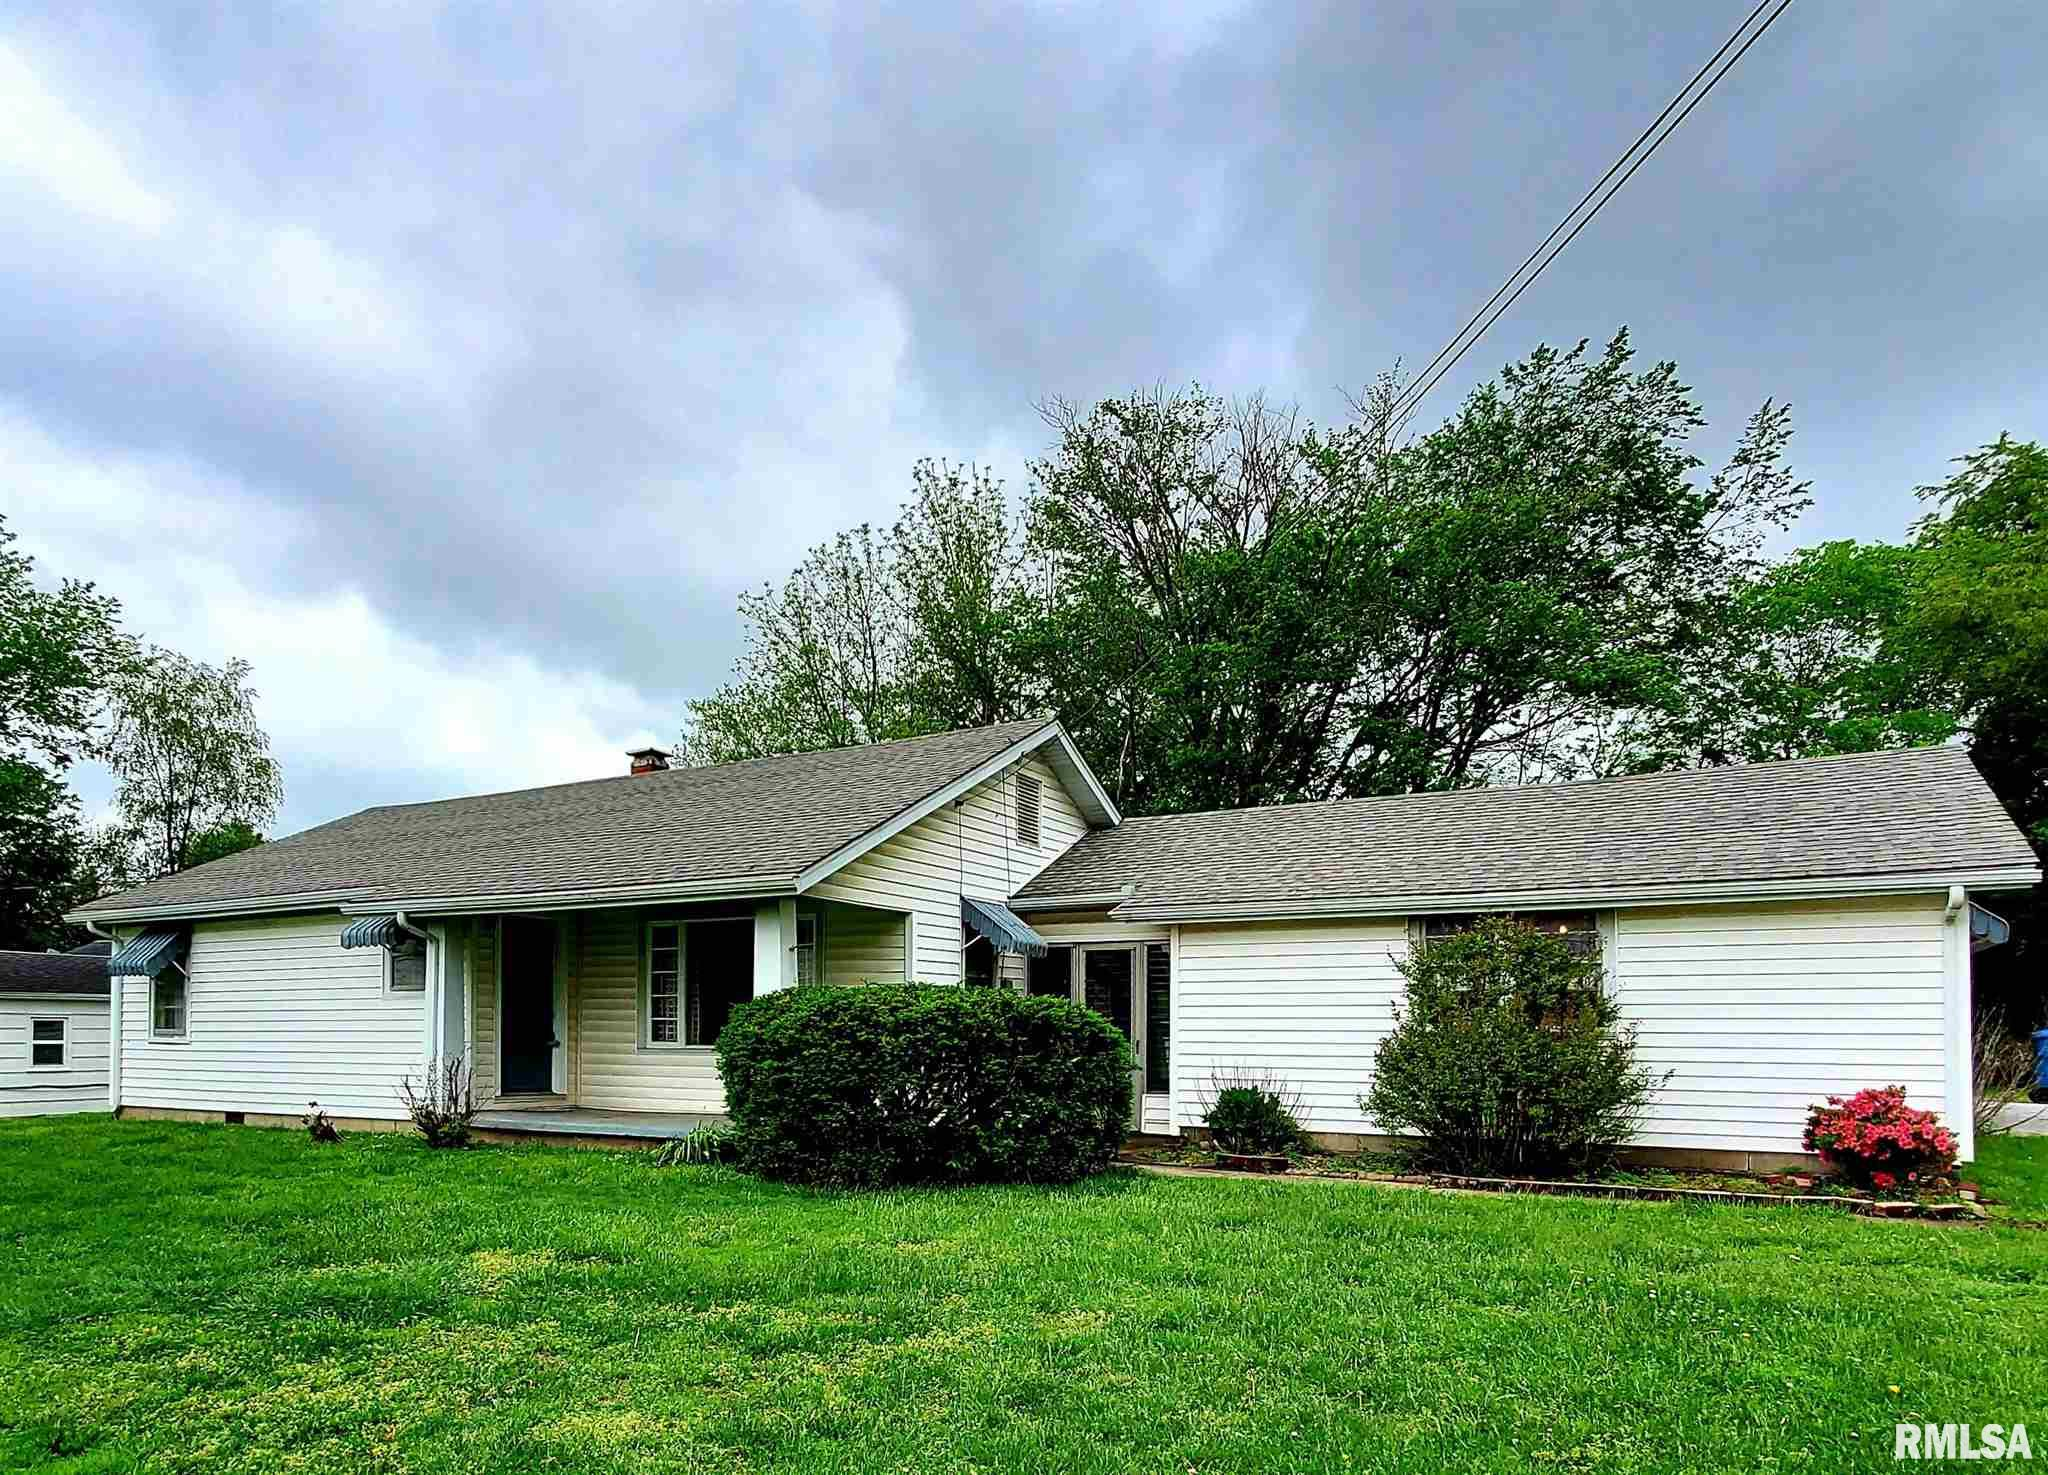 702 W RANDOLPH Property Photo - McLeansboro, IL real estate listing